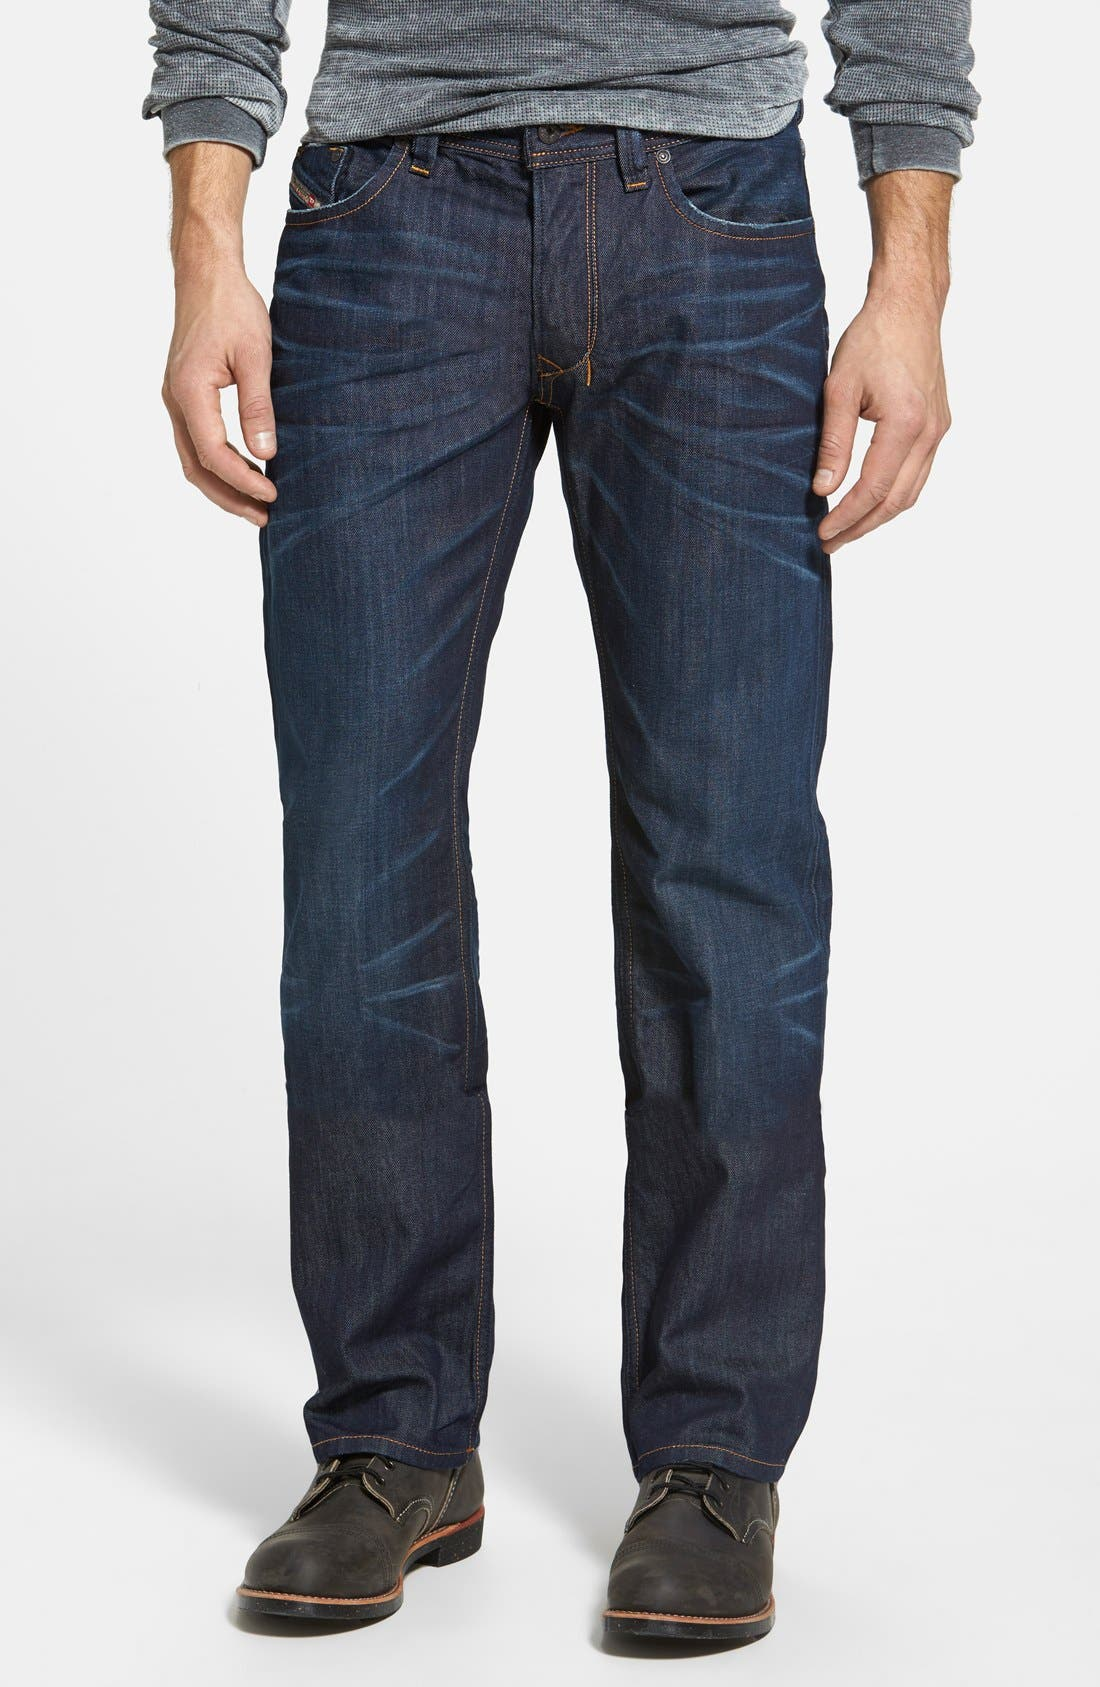 Larkee Straight Leg Jeans,                             Main thumbnail 1, color,                             0806W